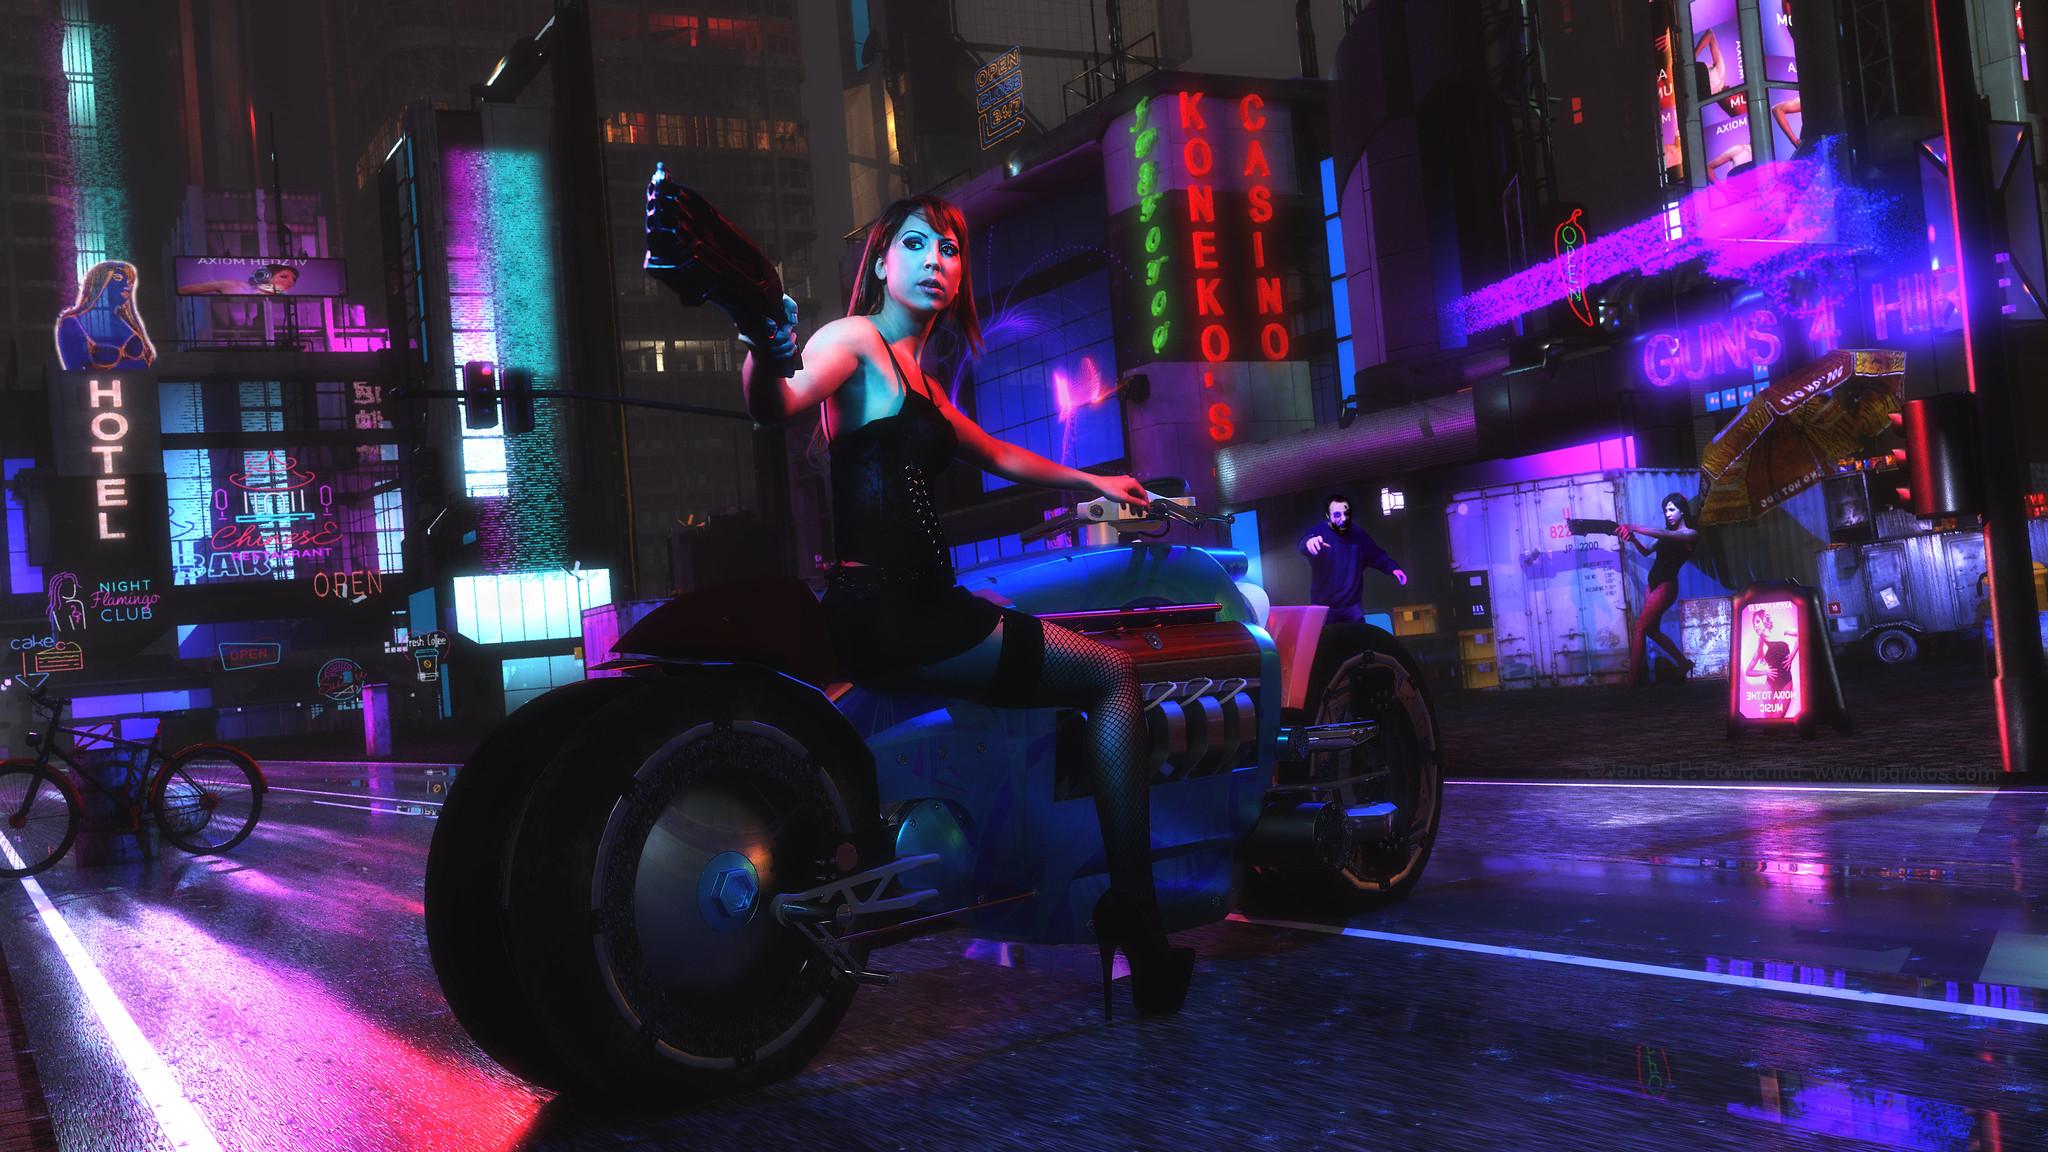 Cyberpunk Street Scene